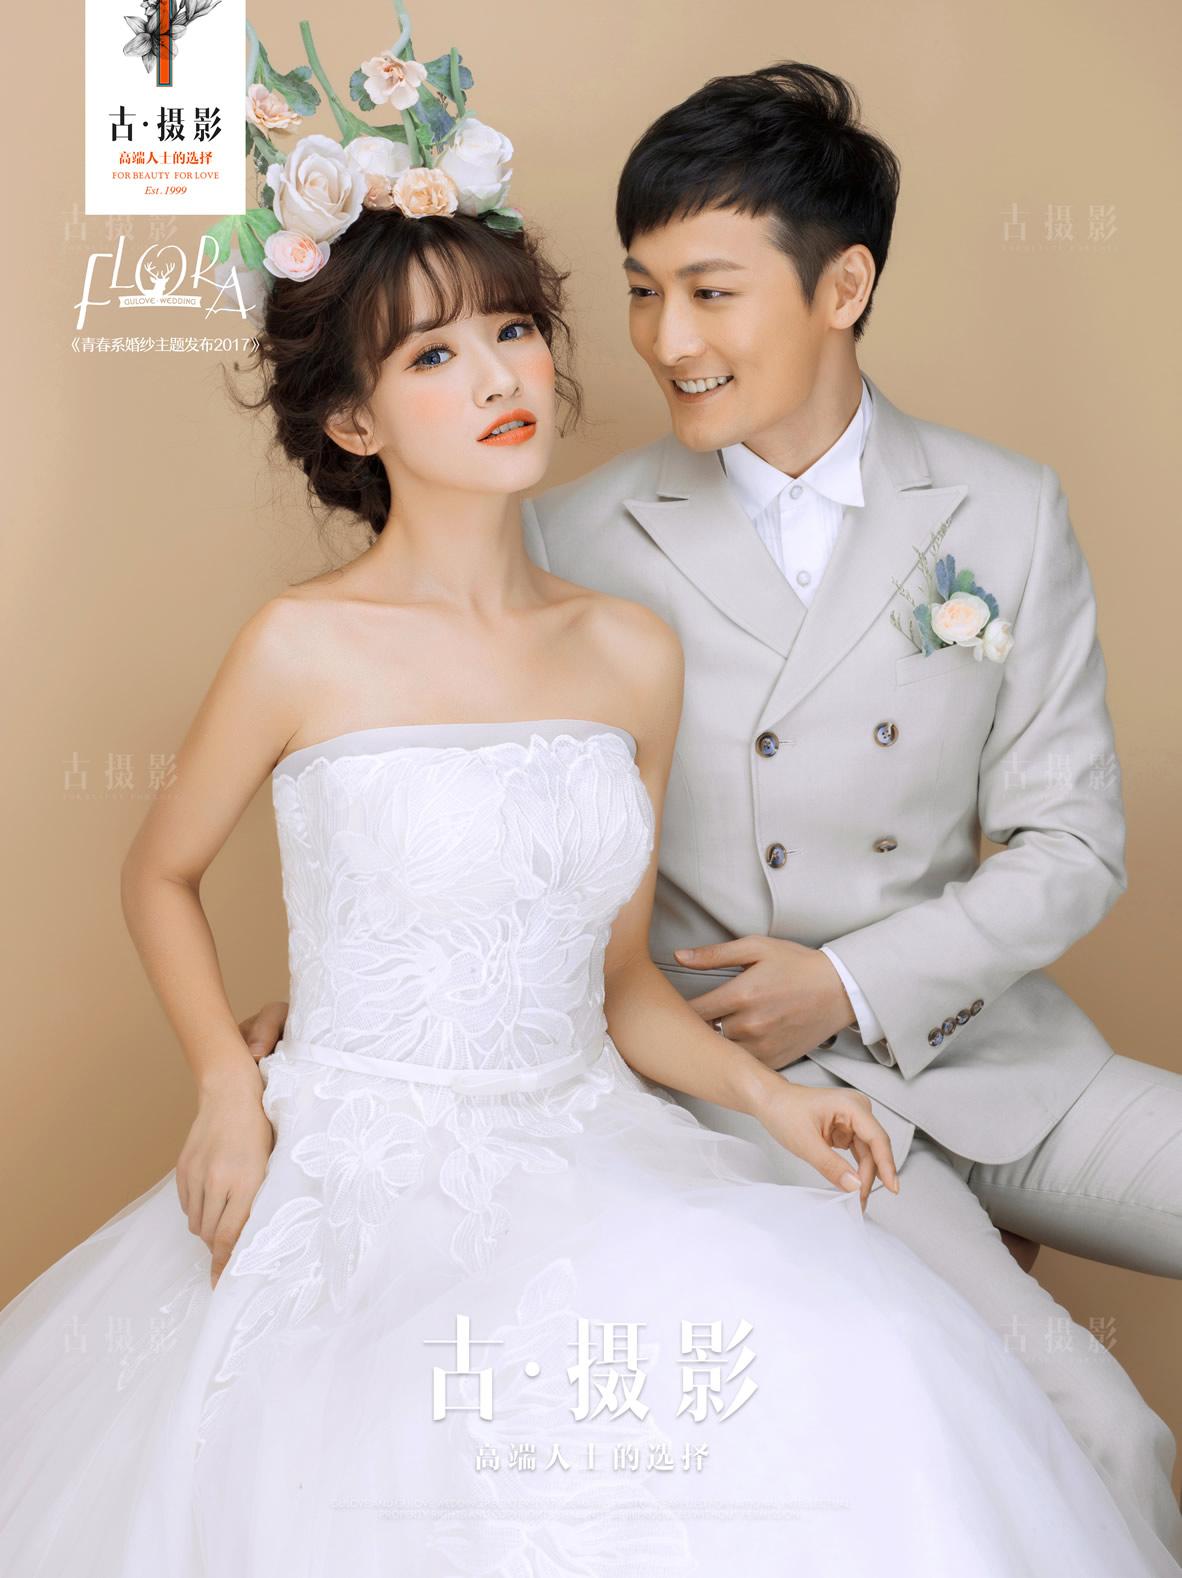 flowers Ⅲ - 明星范 - 武汉古摄影-武汉婚纱摄影艺术摄影网